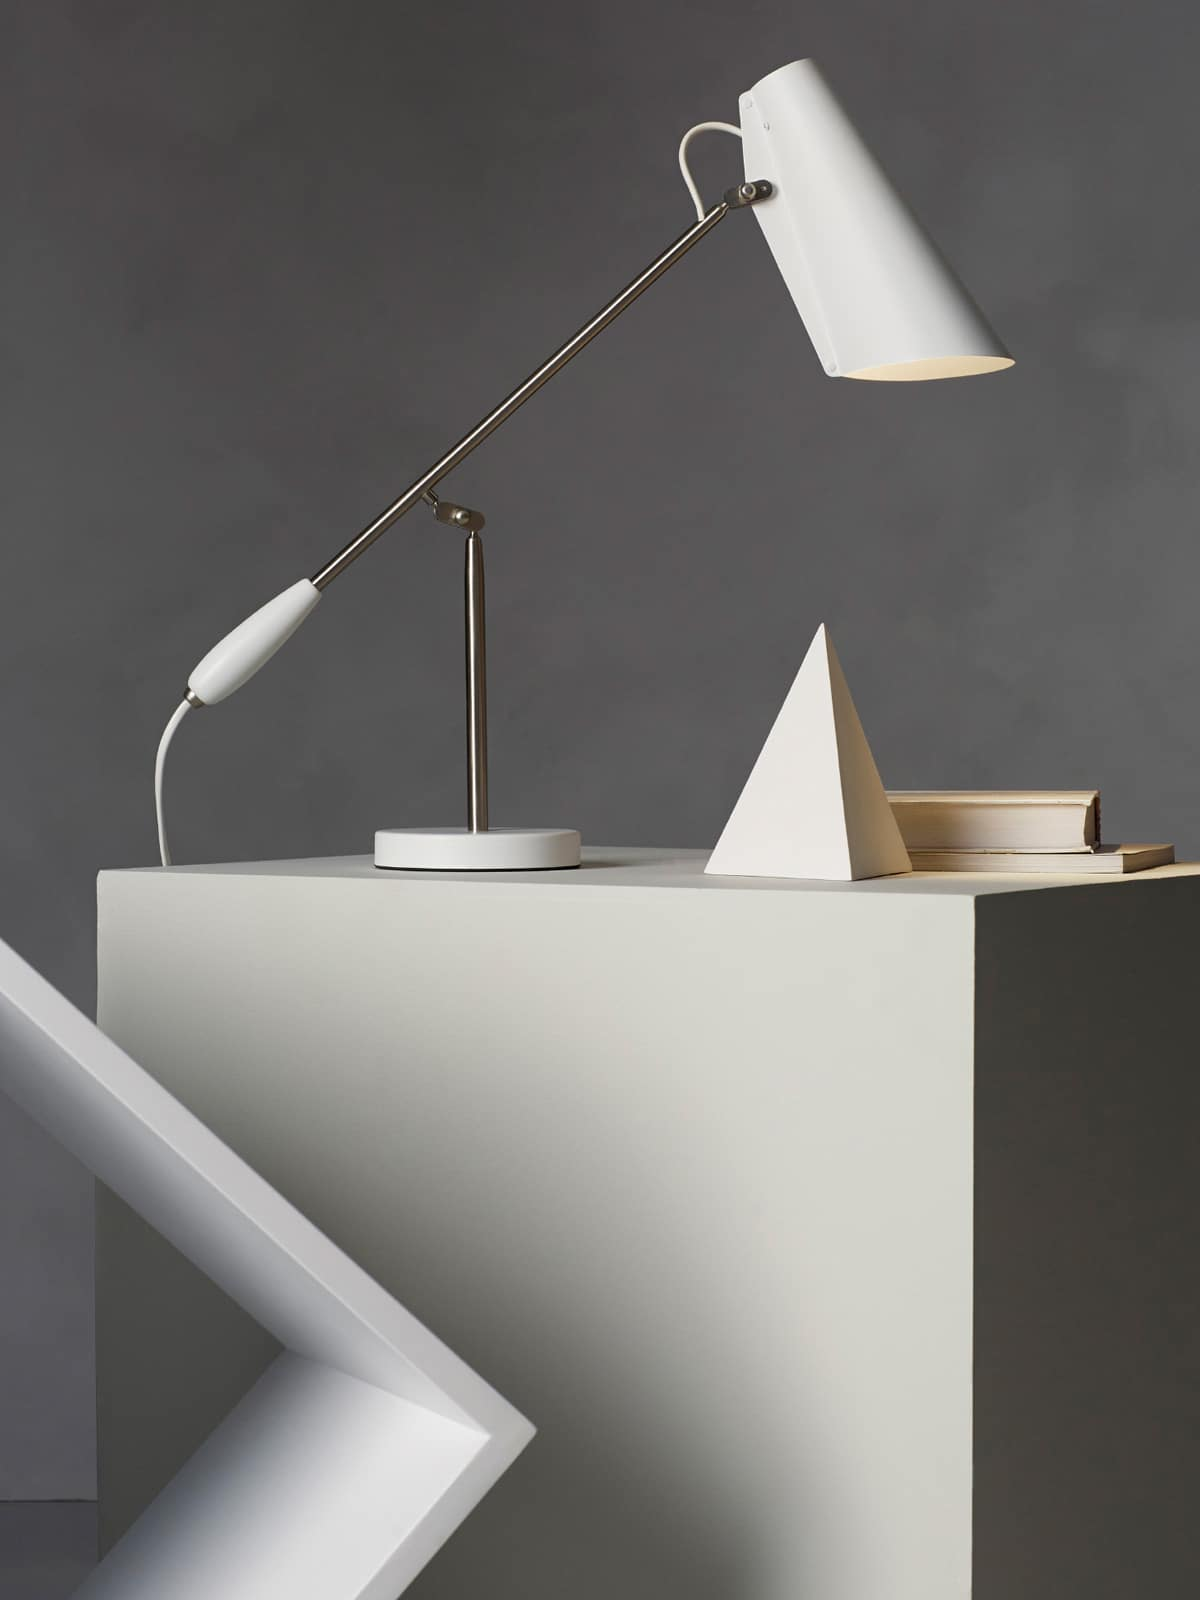 klassische designerleuchten lampen leuchten. Black Bedroom Furniture Sets. Home Design Ideas